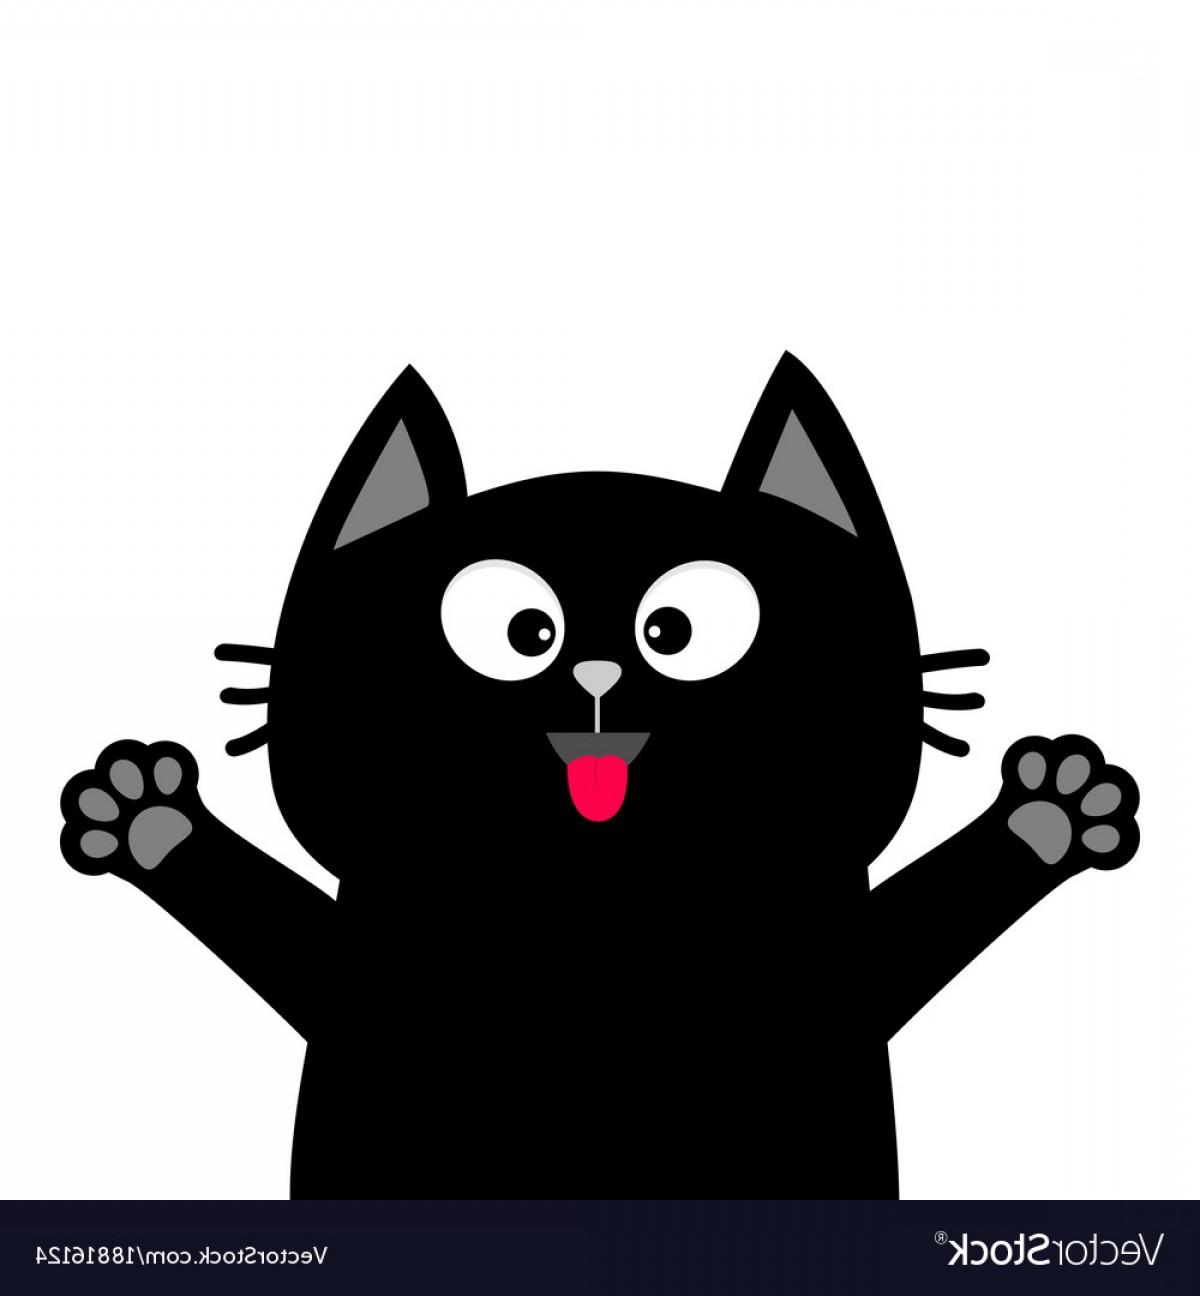 1200x1296 Black Cat Face Head Tongue Paw Print Silhouette Vector Shopatcloth